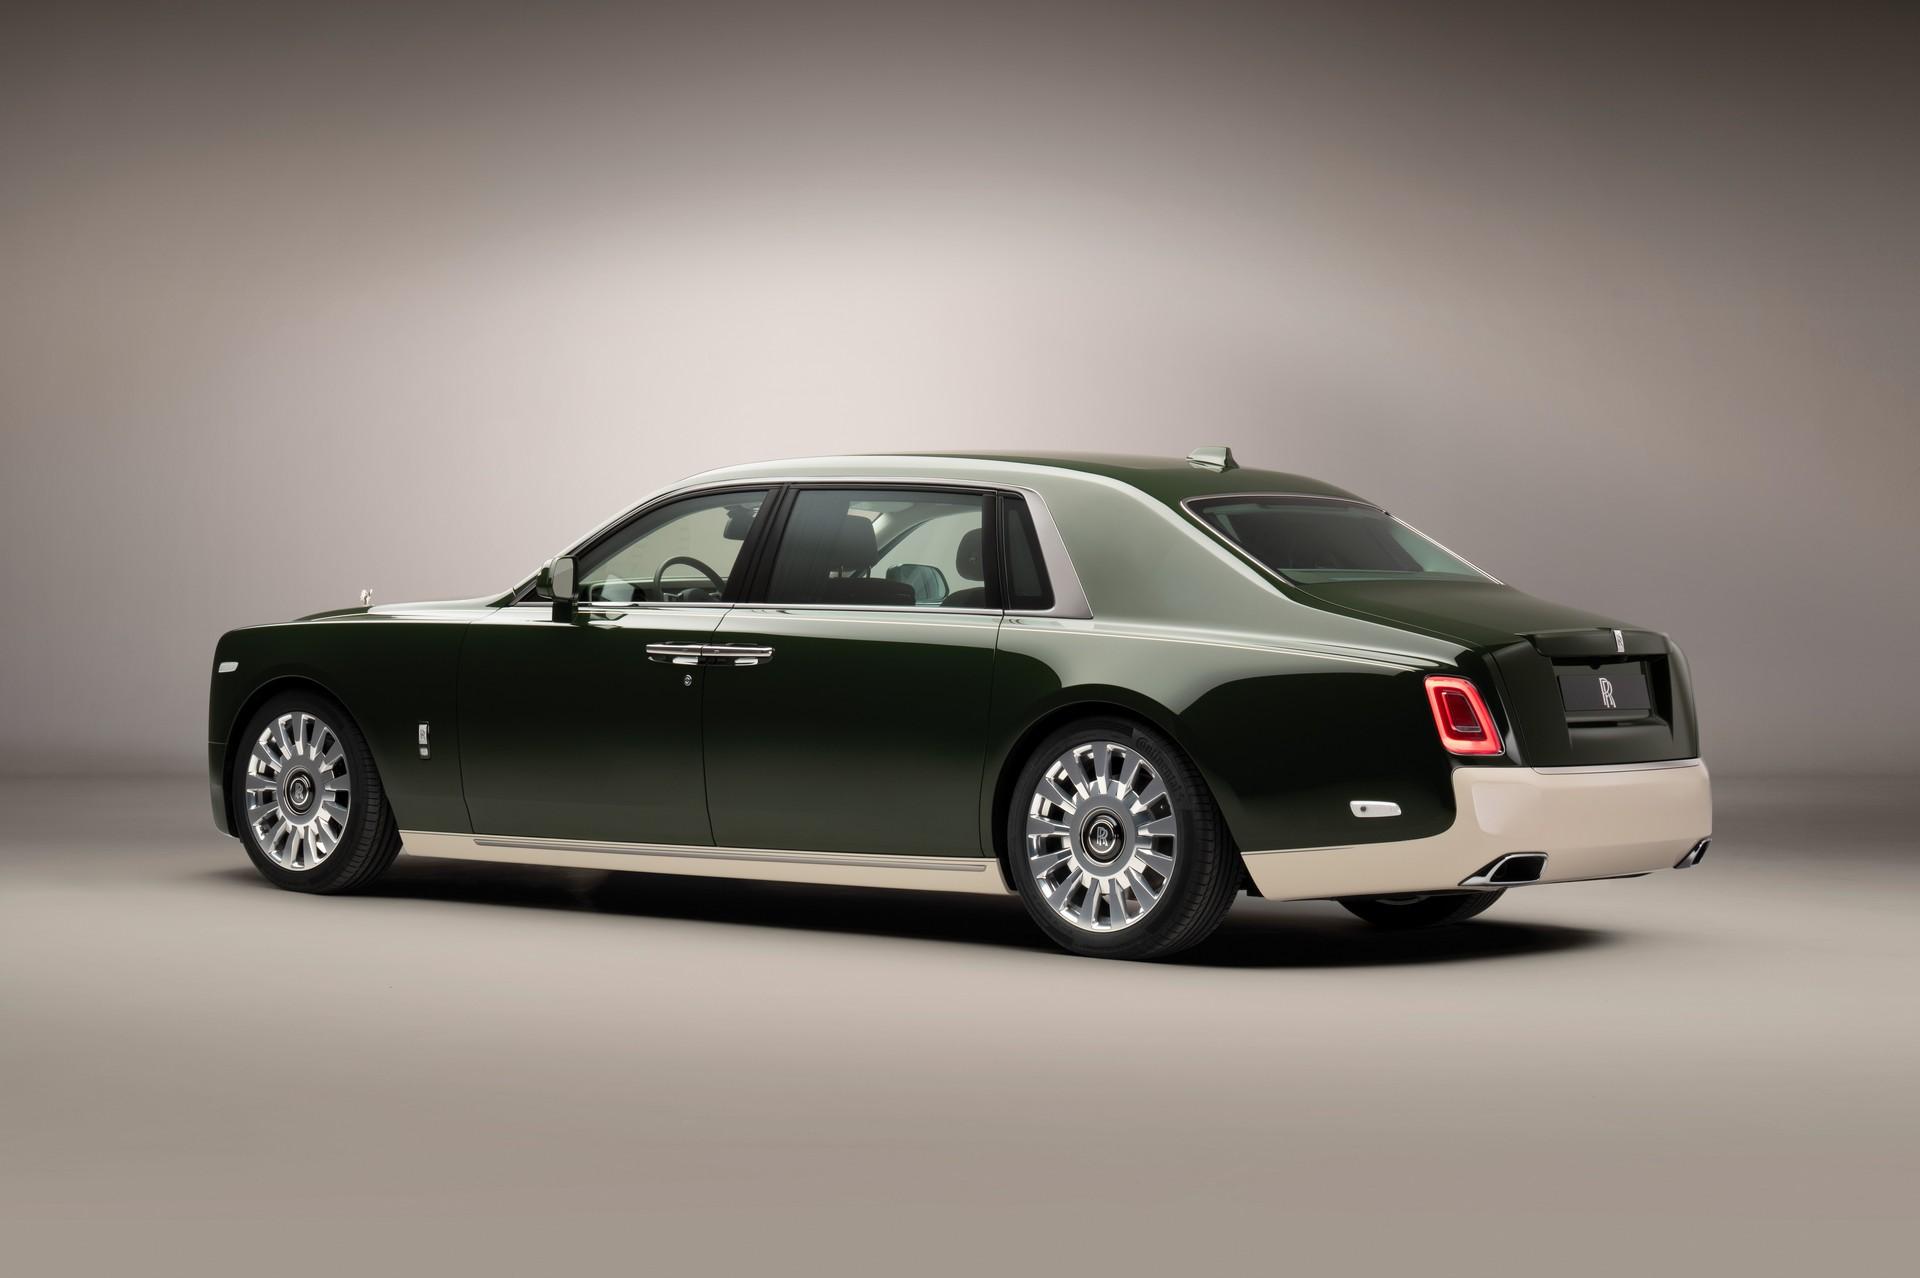 Rolls-Royce-Phantom-Oribe-10.jpg